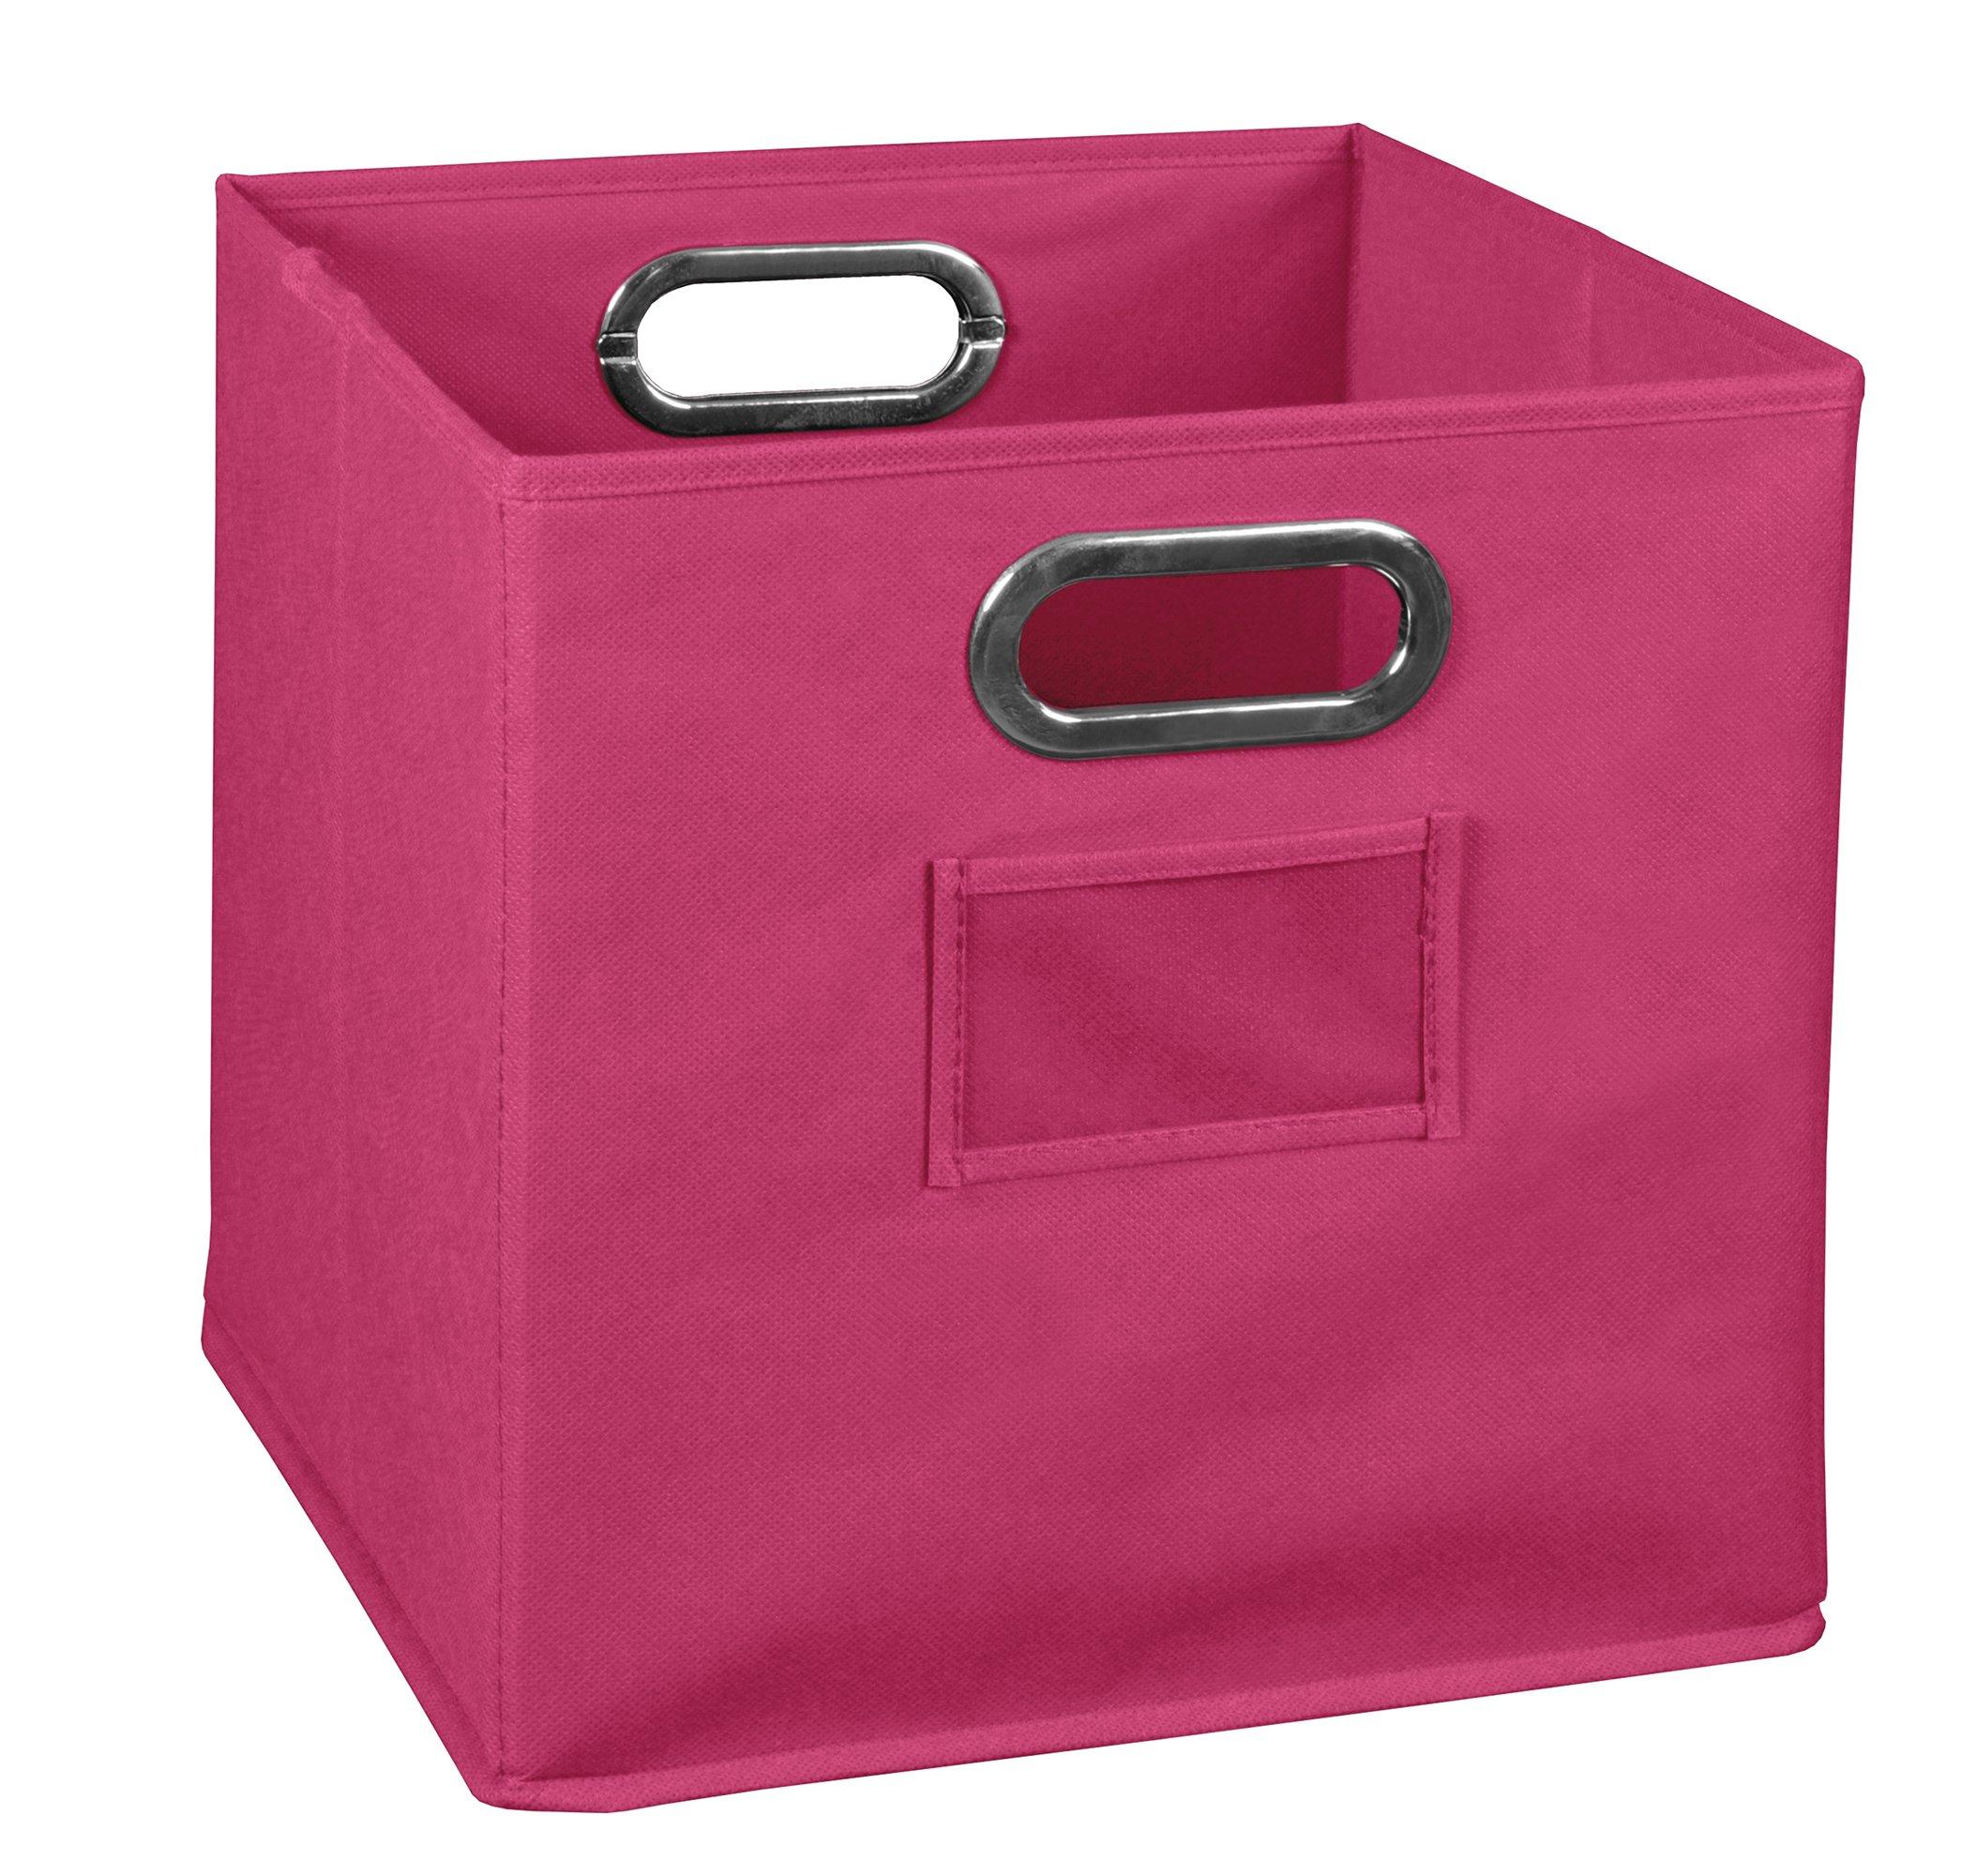 Niche Cubo Foldable Fabric Bin- Pink